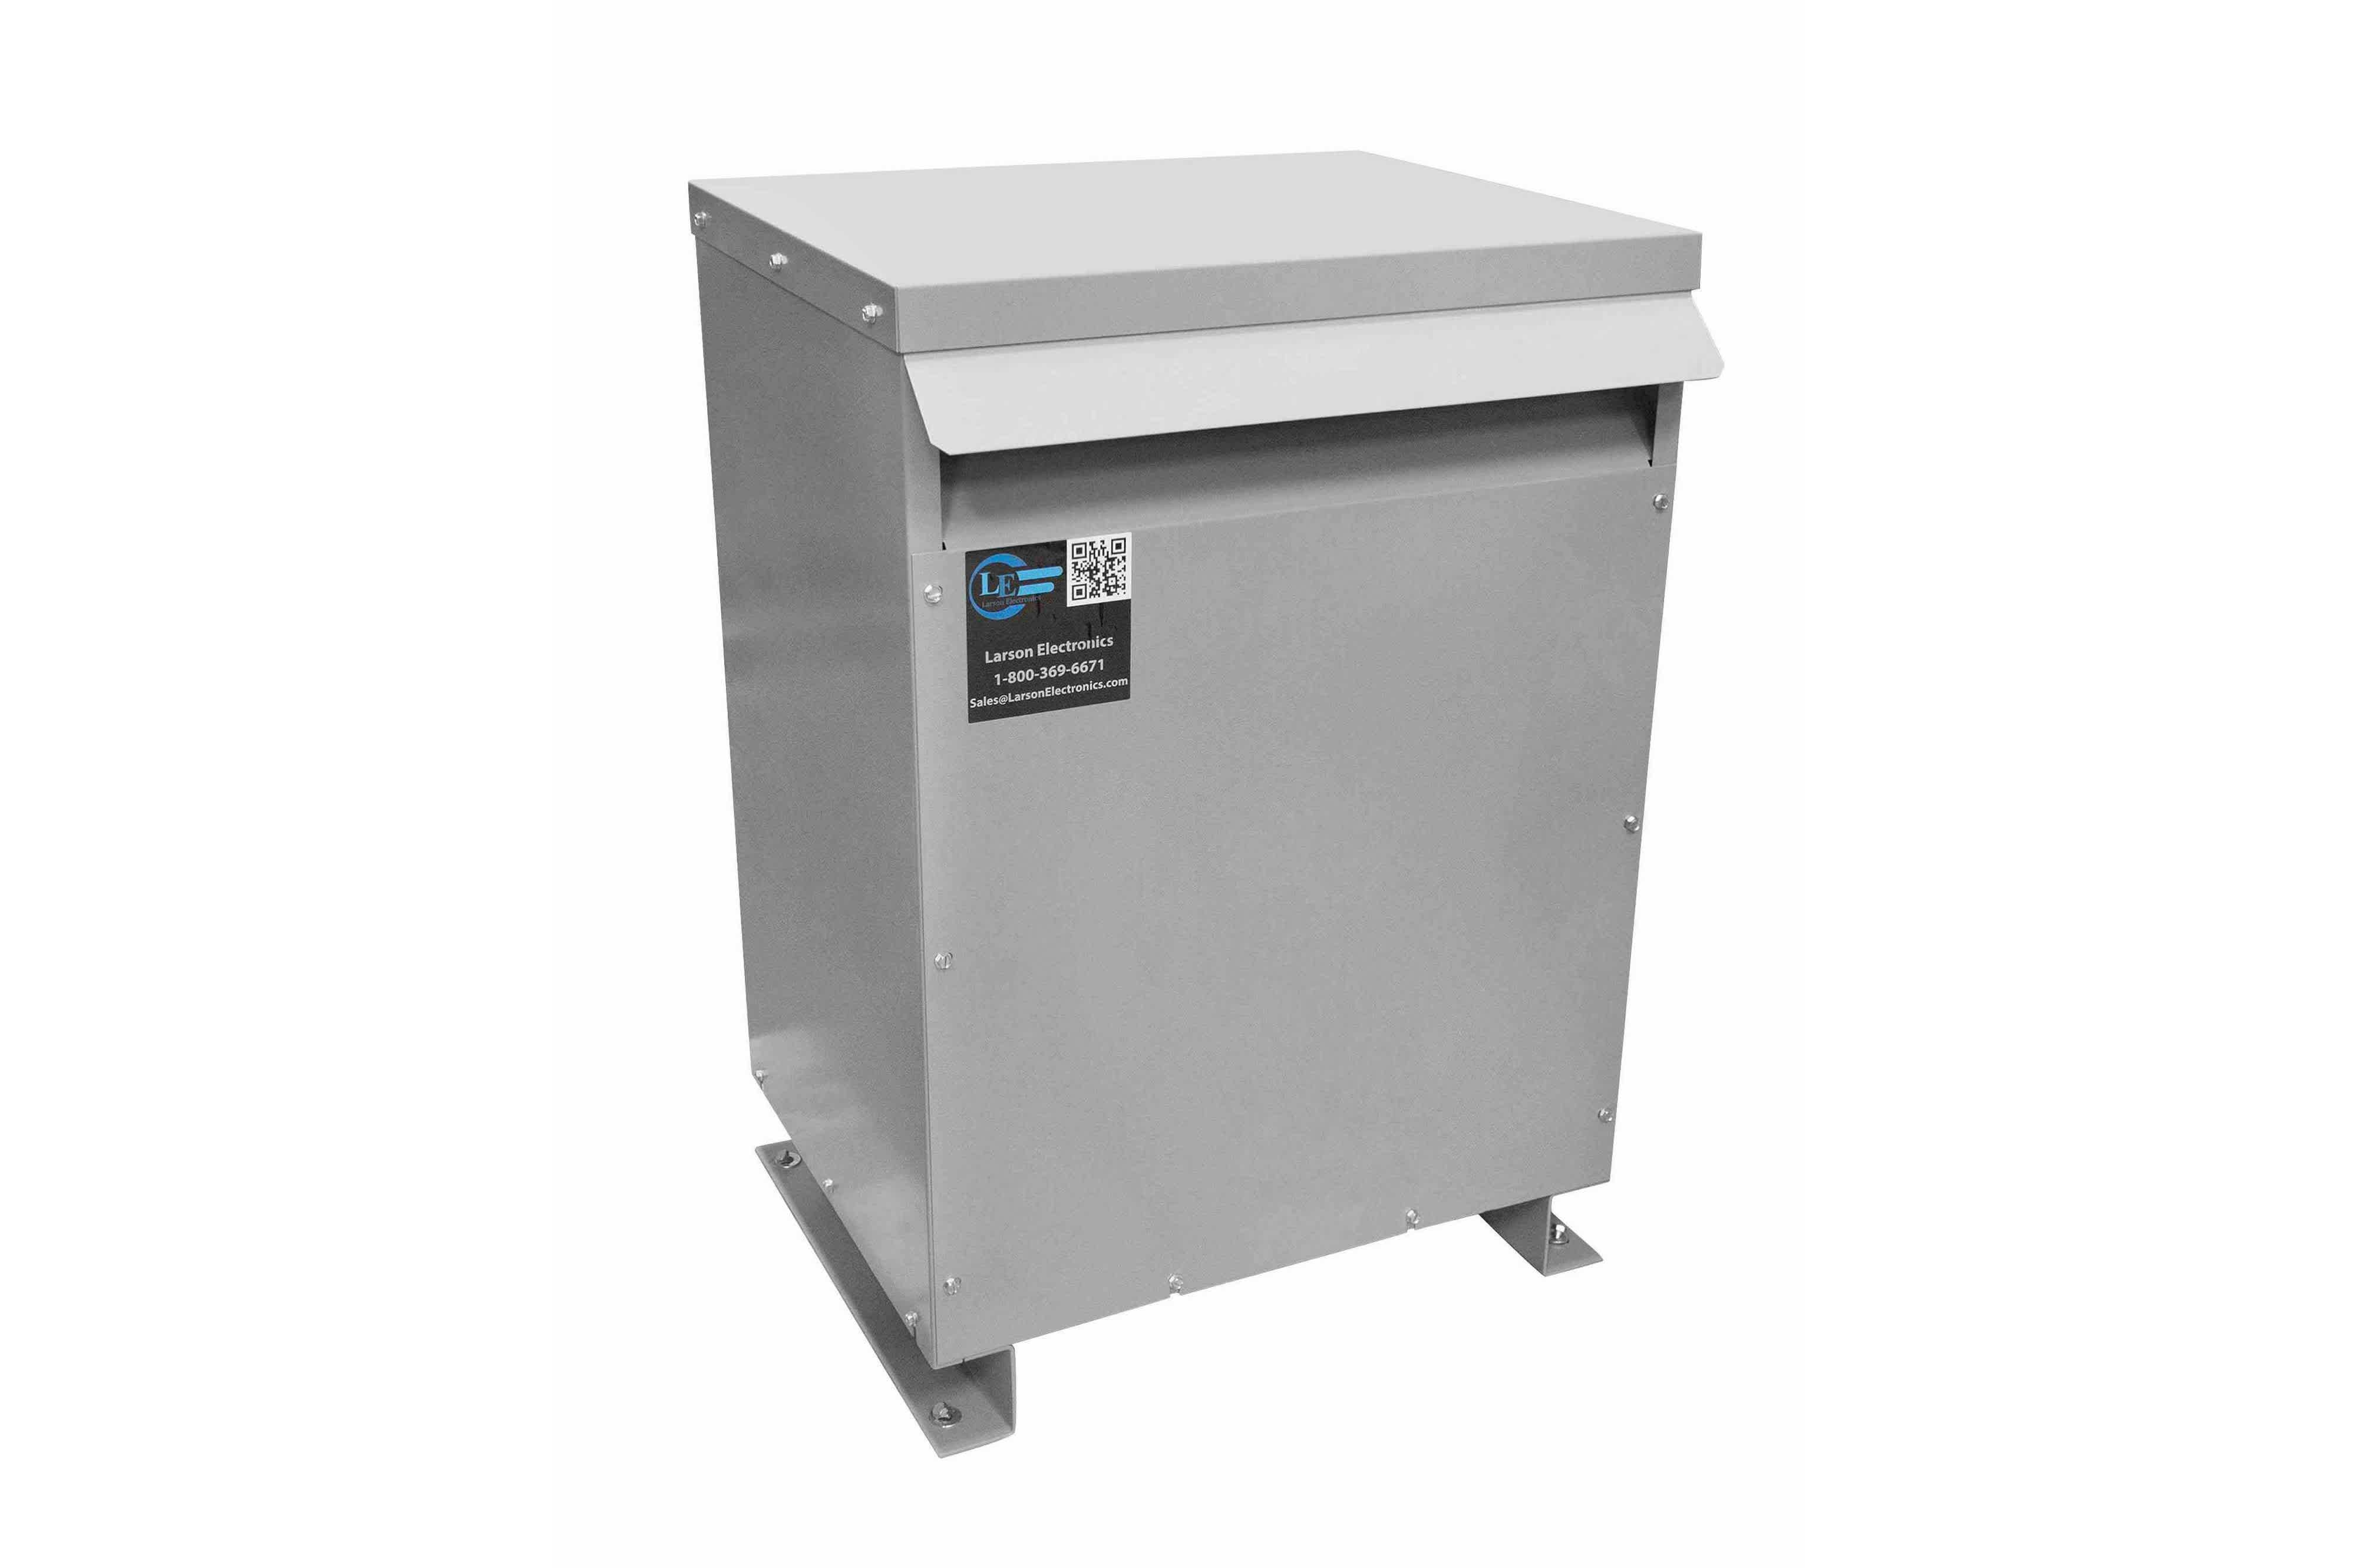 13 kVA 3PH Isolation Transformer, 240V Wye Primary, 208V Delta Secondary, N3R, Ventilated, 60 Hz